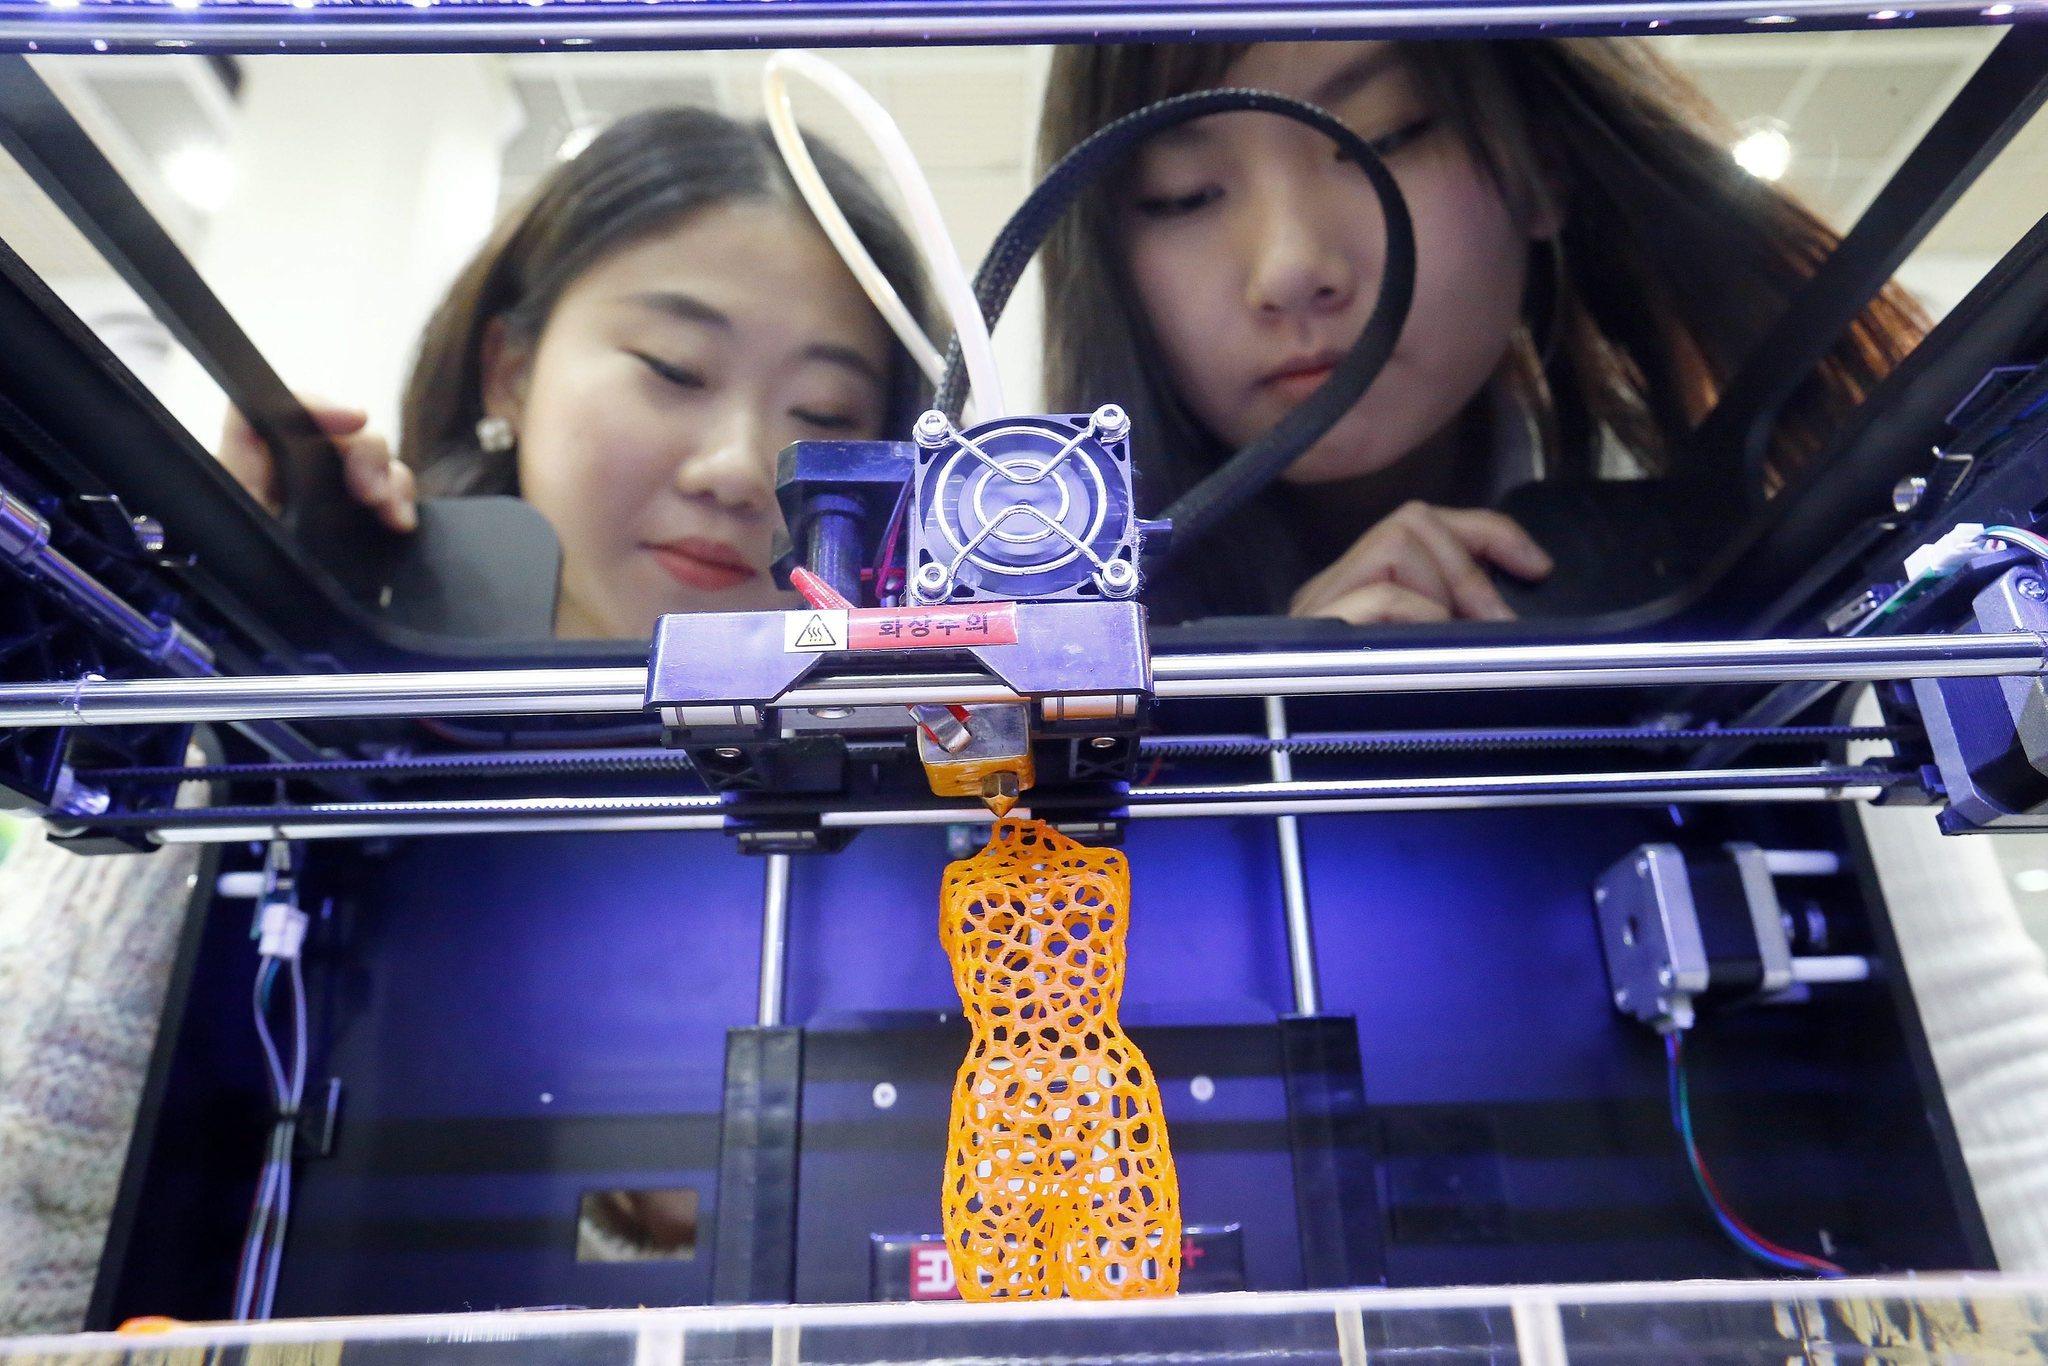 Global 3D printer market research